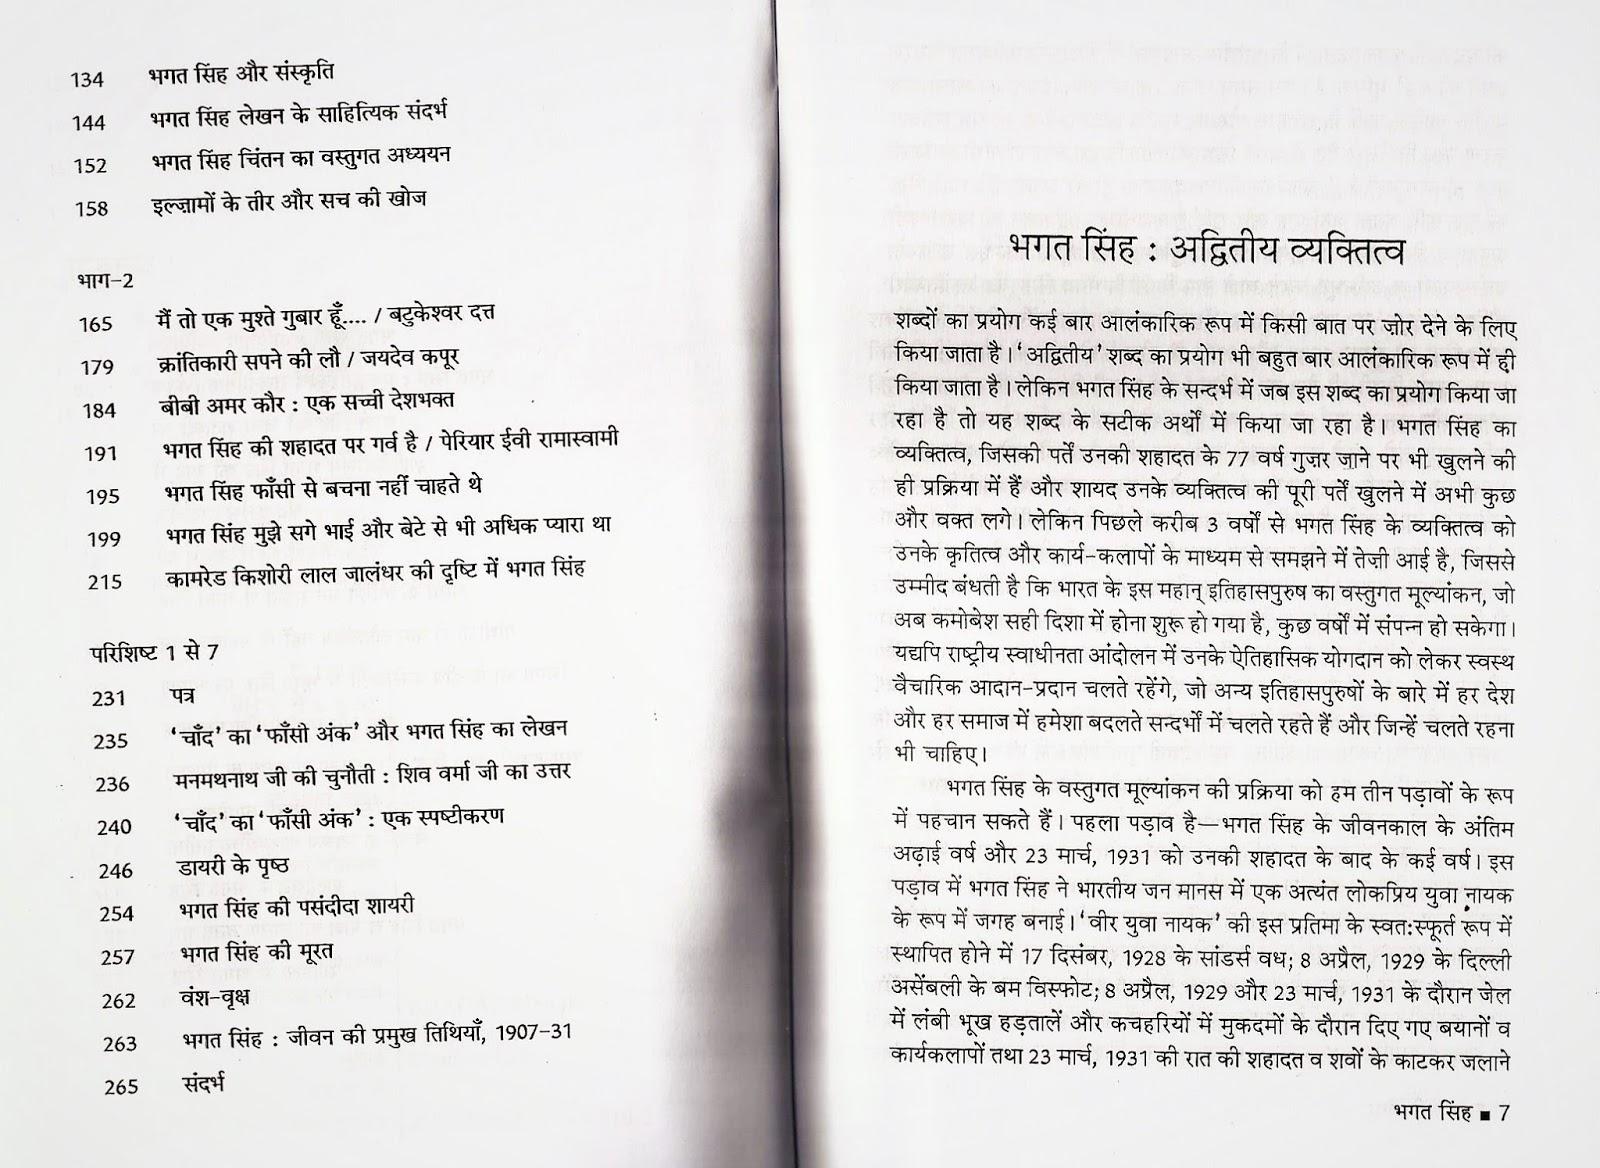 001 Bhagat2bsingh Medha2bpaperback Essay Example On Bhagat Singh In Unique Marathi Short 100 Words Full